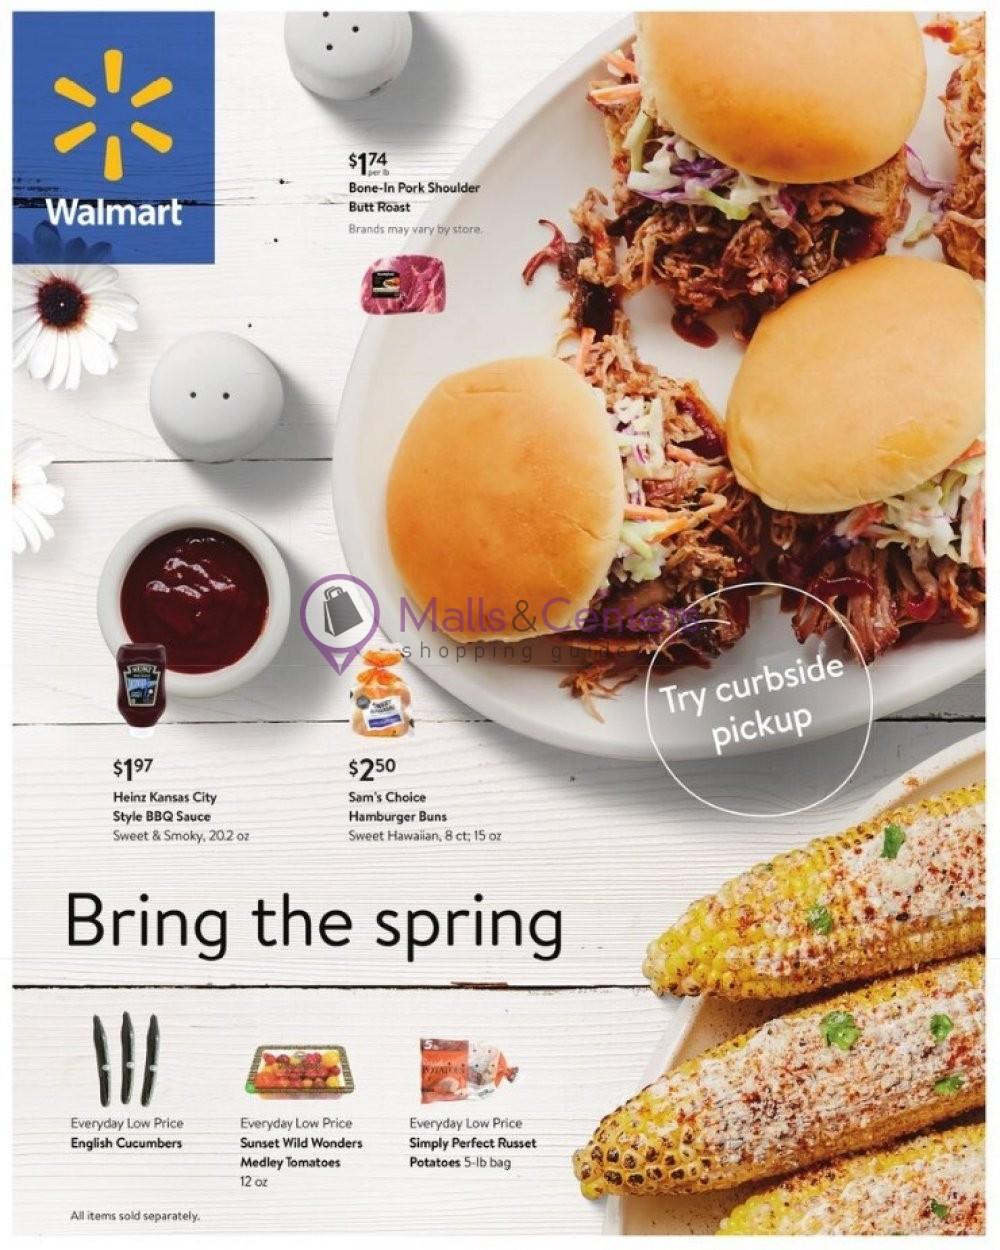 weekly ads Walmart - page 1 - mallscenters.com